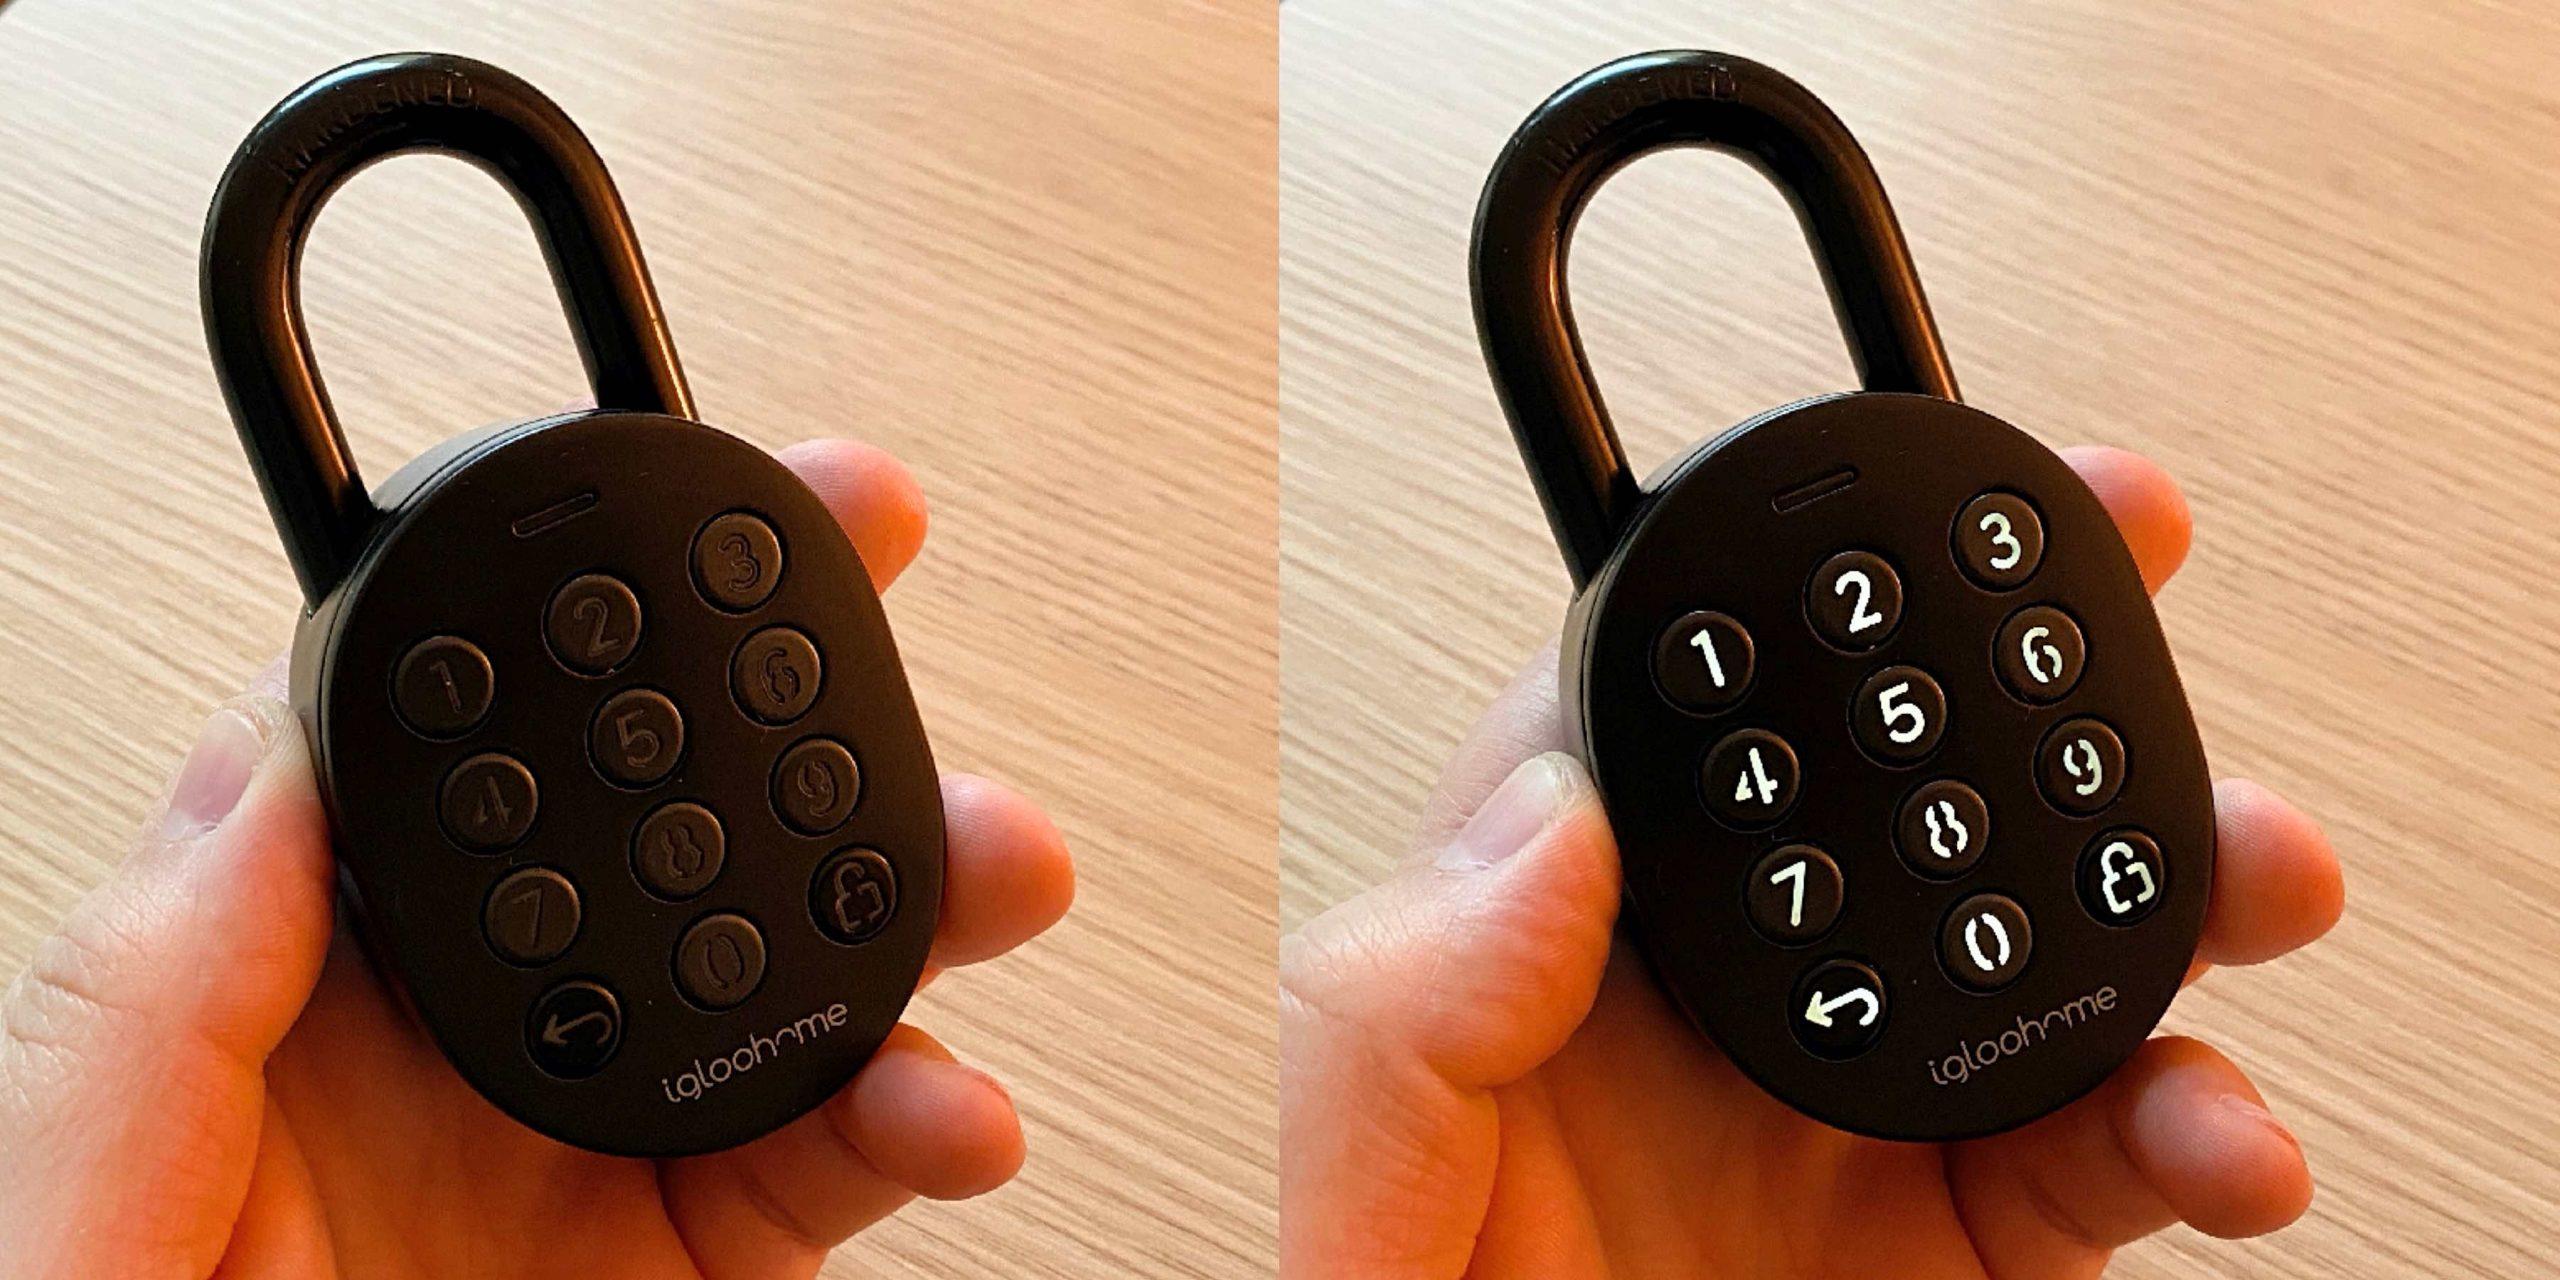 igloohome_Smart_Padlock_vorhängeschloss_Bluetooth1-scaled igloohome Smart Padlock - das smarte Vorhängeschloss